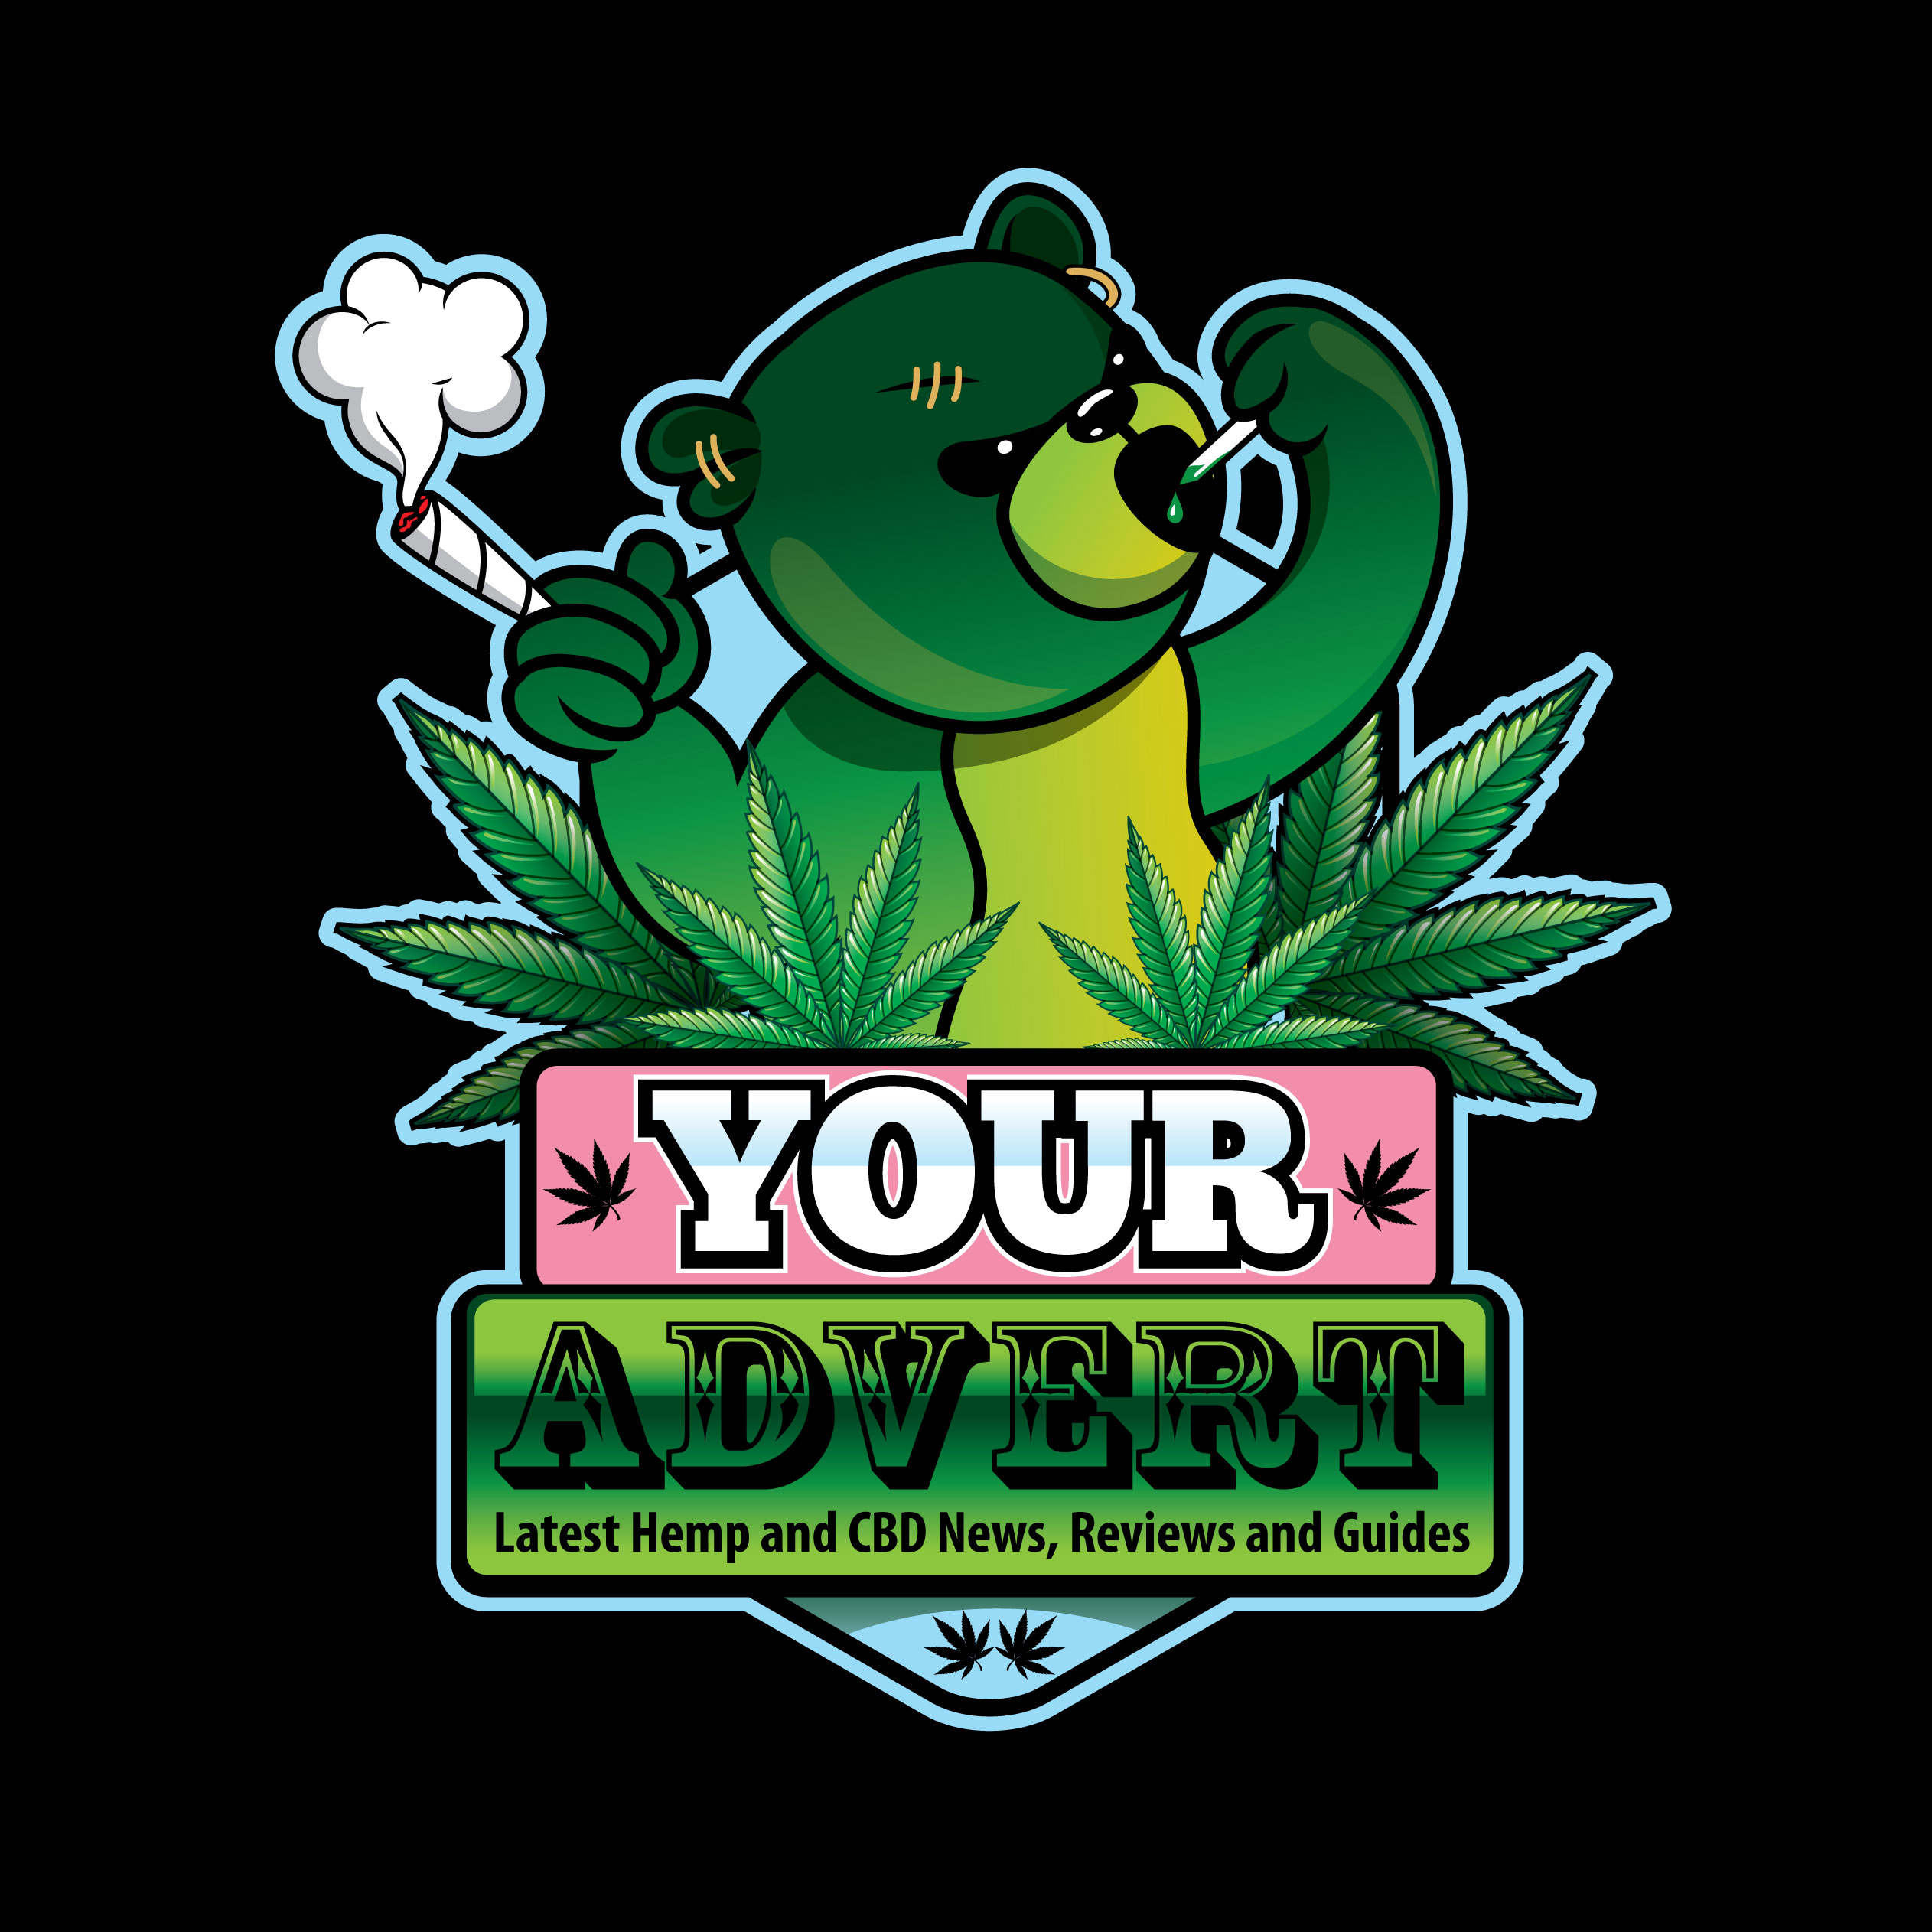 CBD Banner Advertising